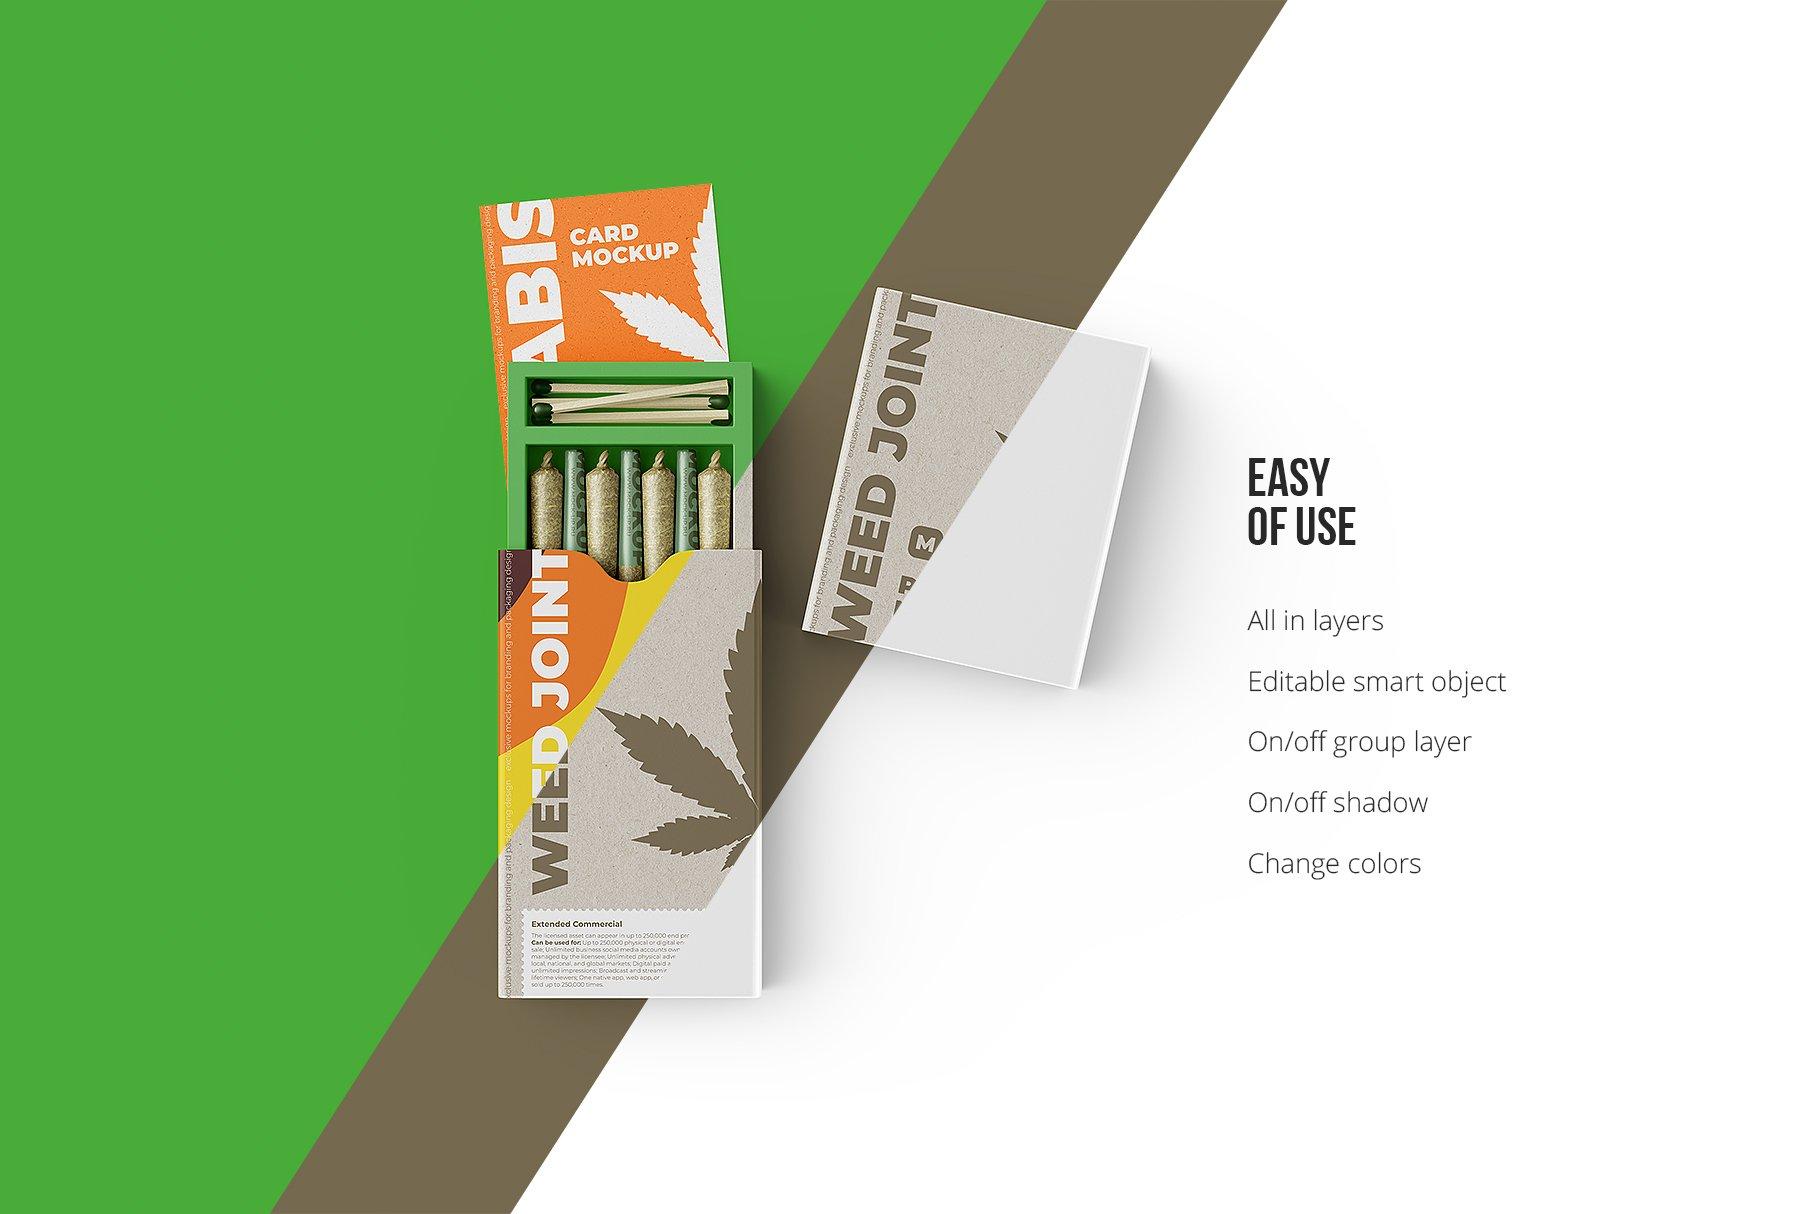 烟草香烟雪茄包装纸盒设计展示贴图样机 Weed Joint Packaging Mockup插图4